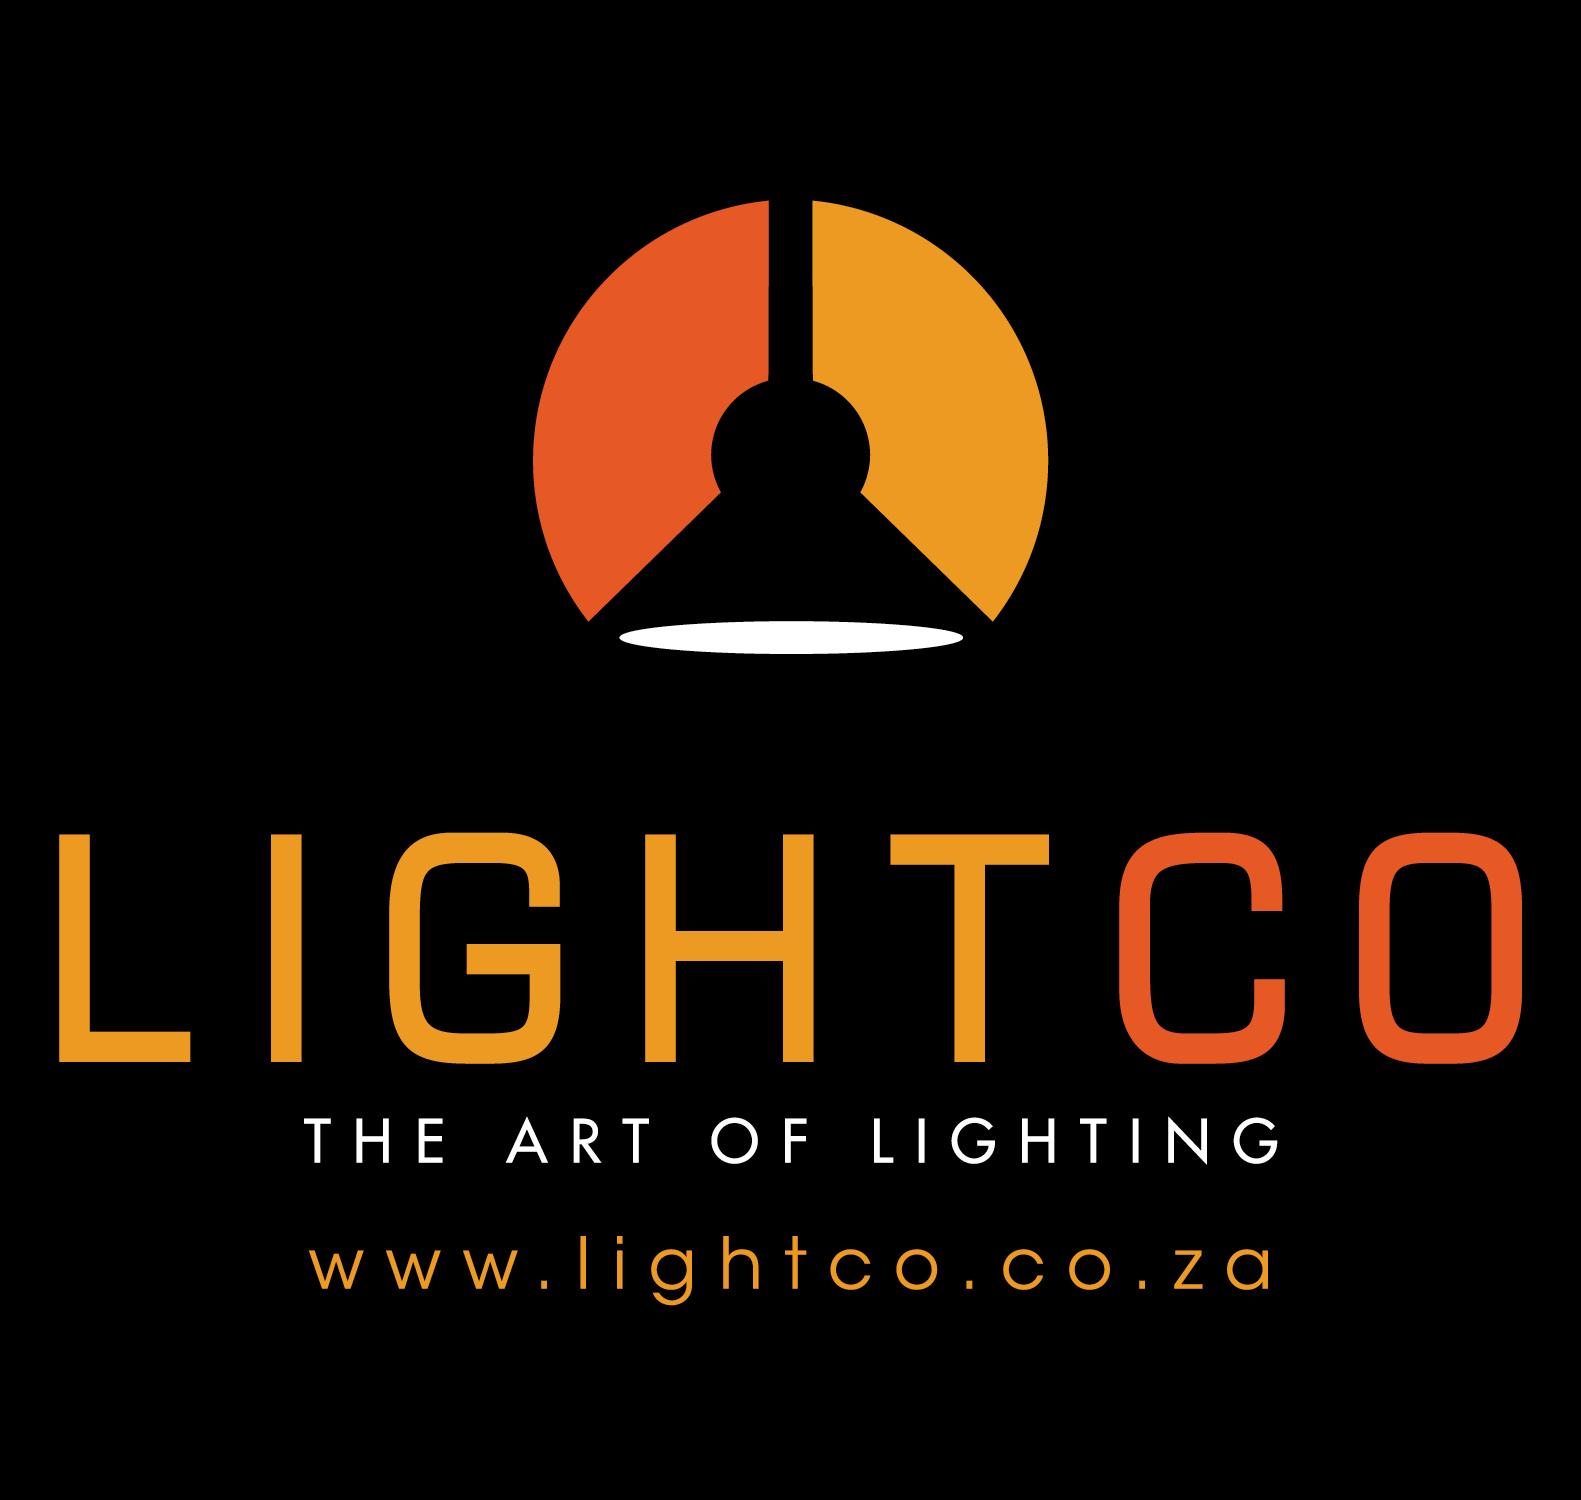 Bathroom Lights Durban lightco lighting suppliers lighting, home improvement, home